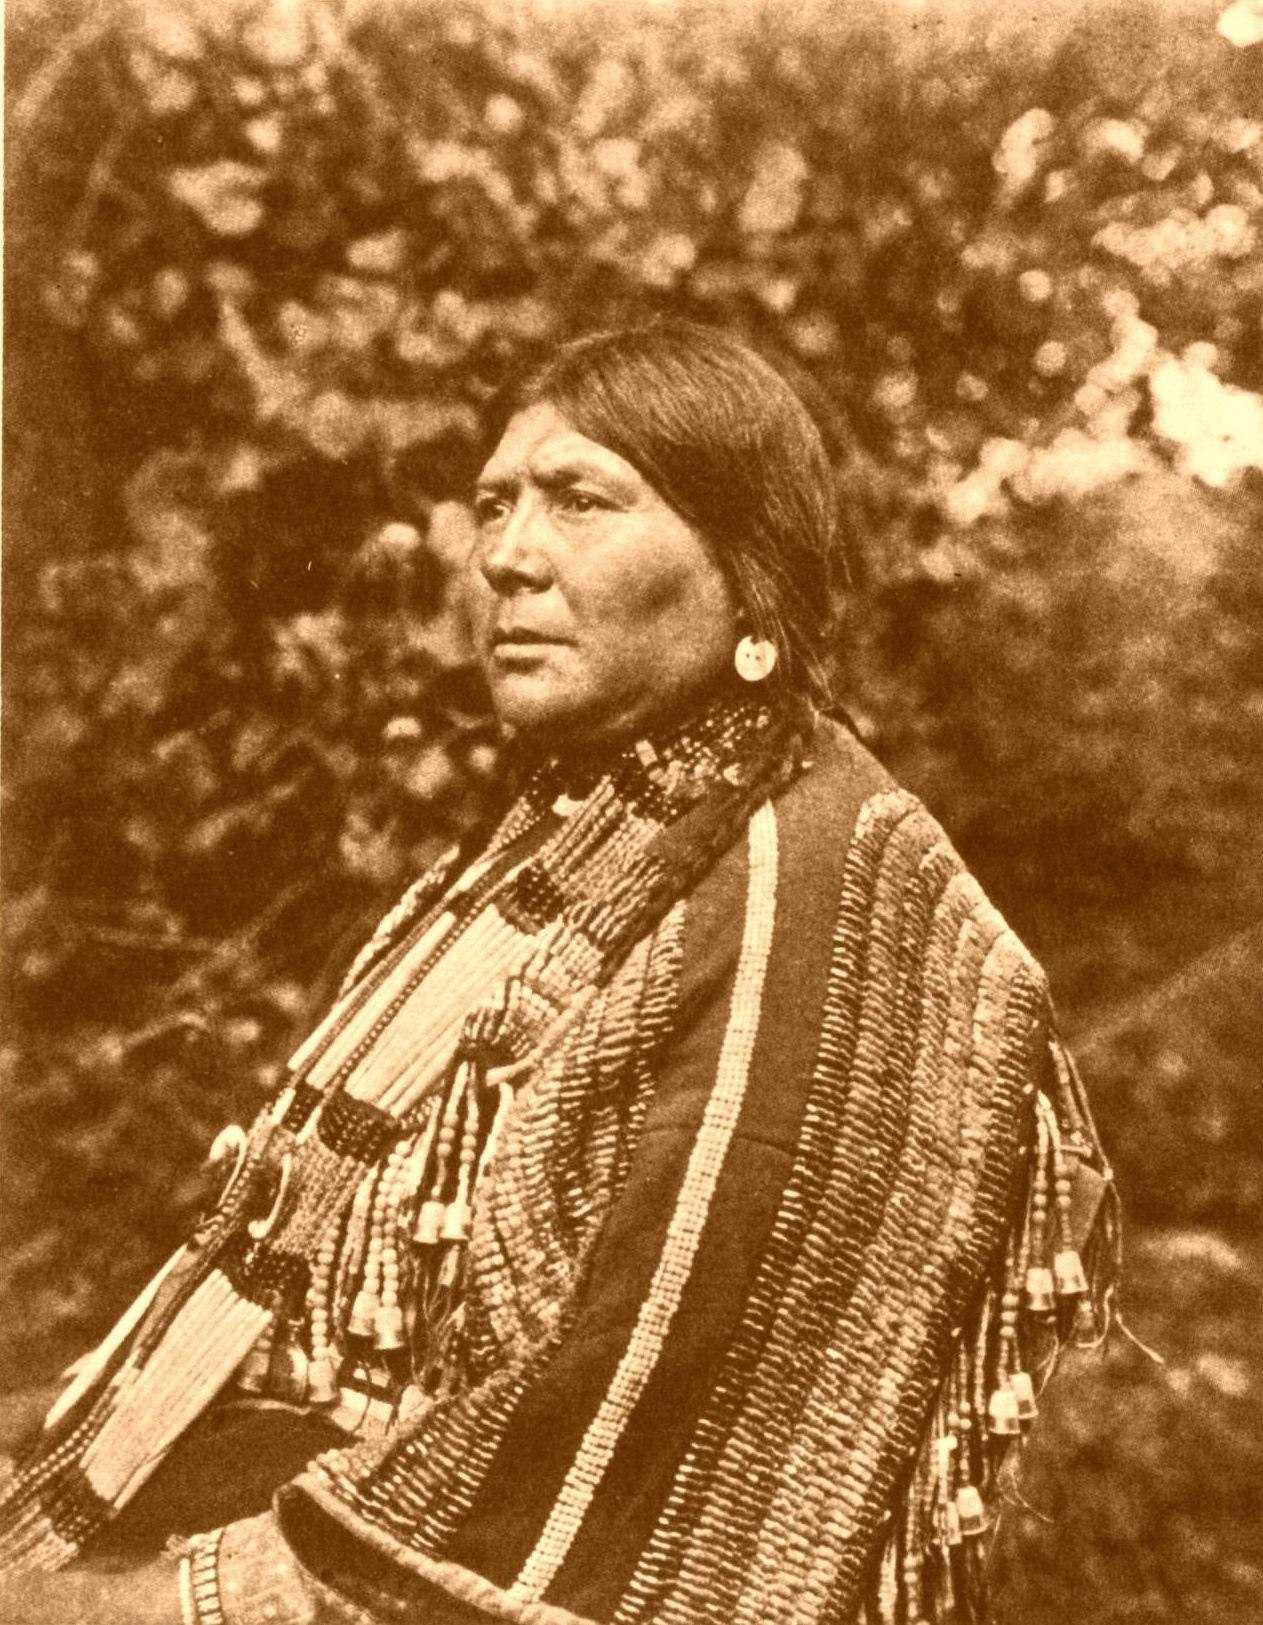 Blackfoot Indian Woman - Bing Images